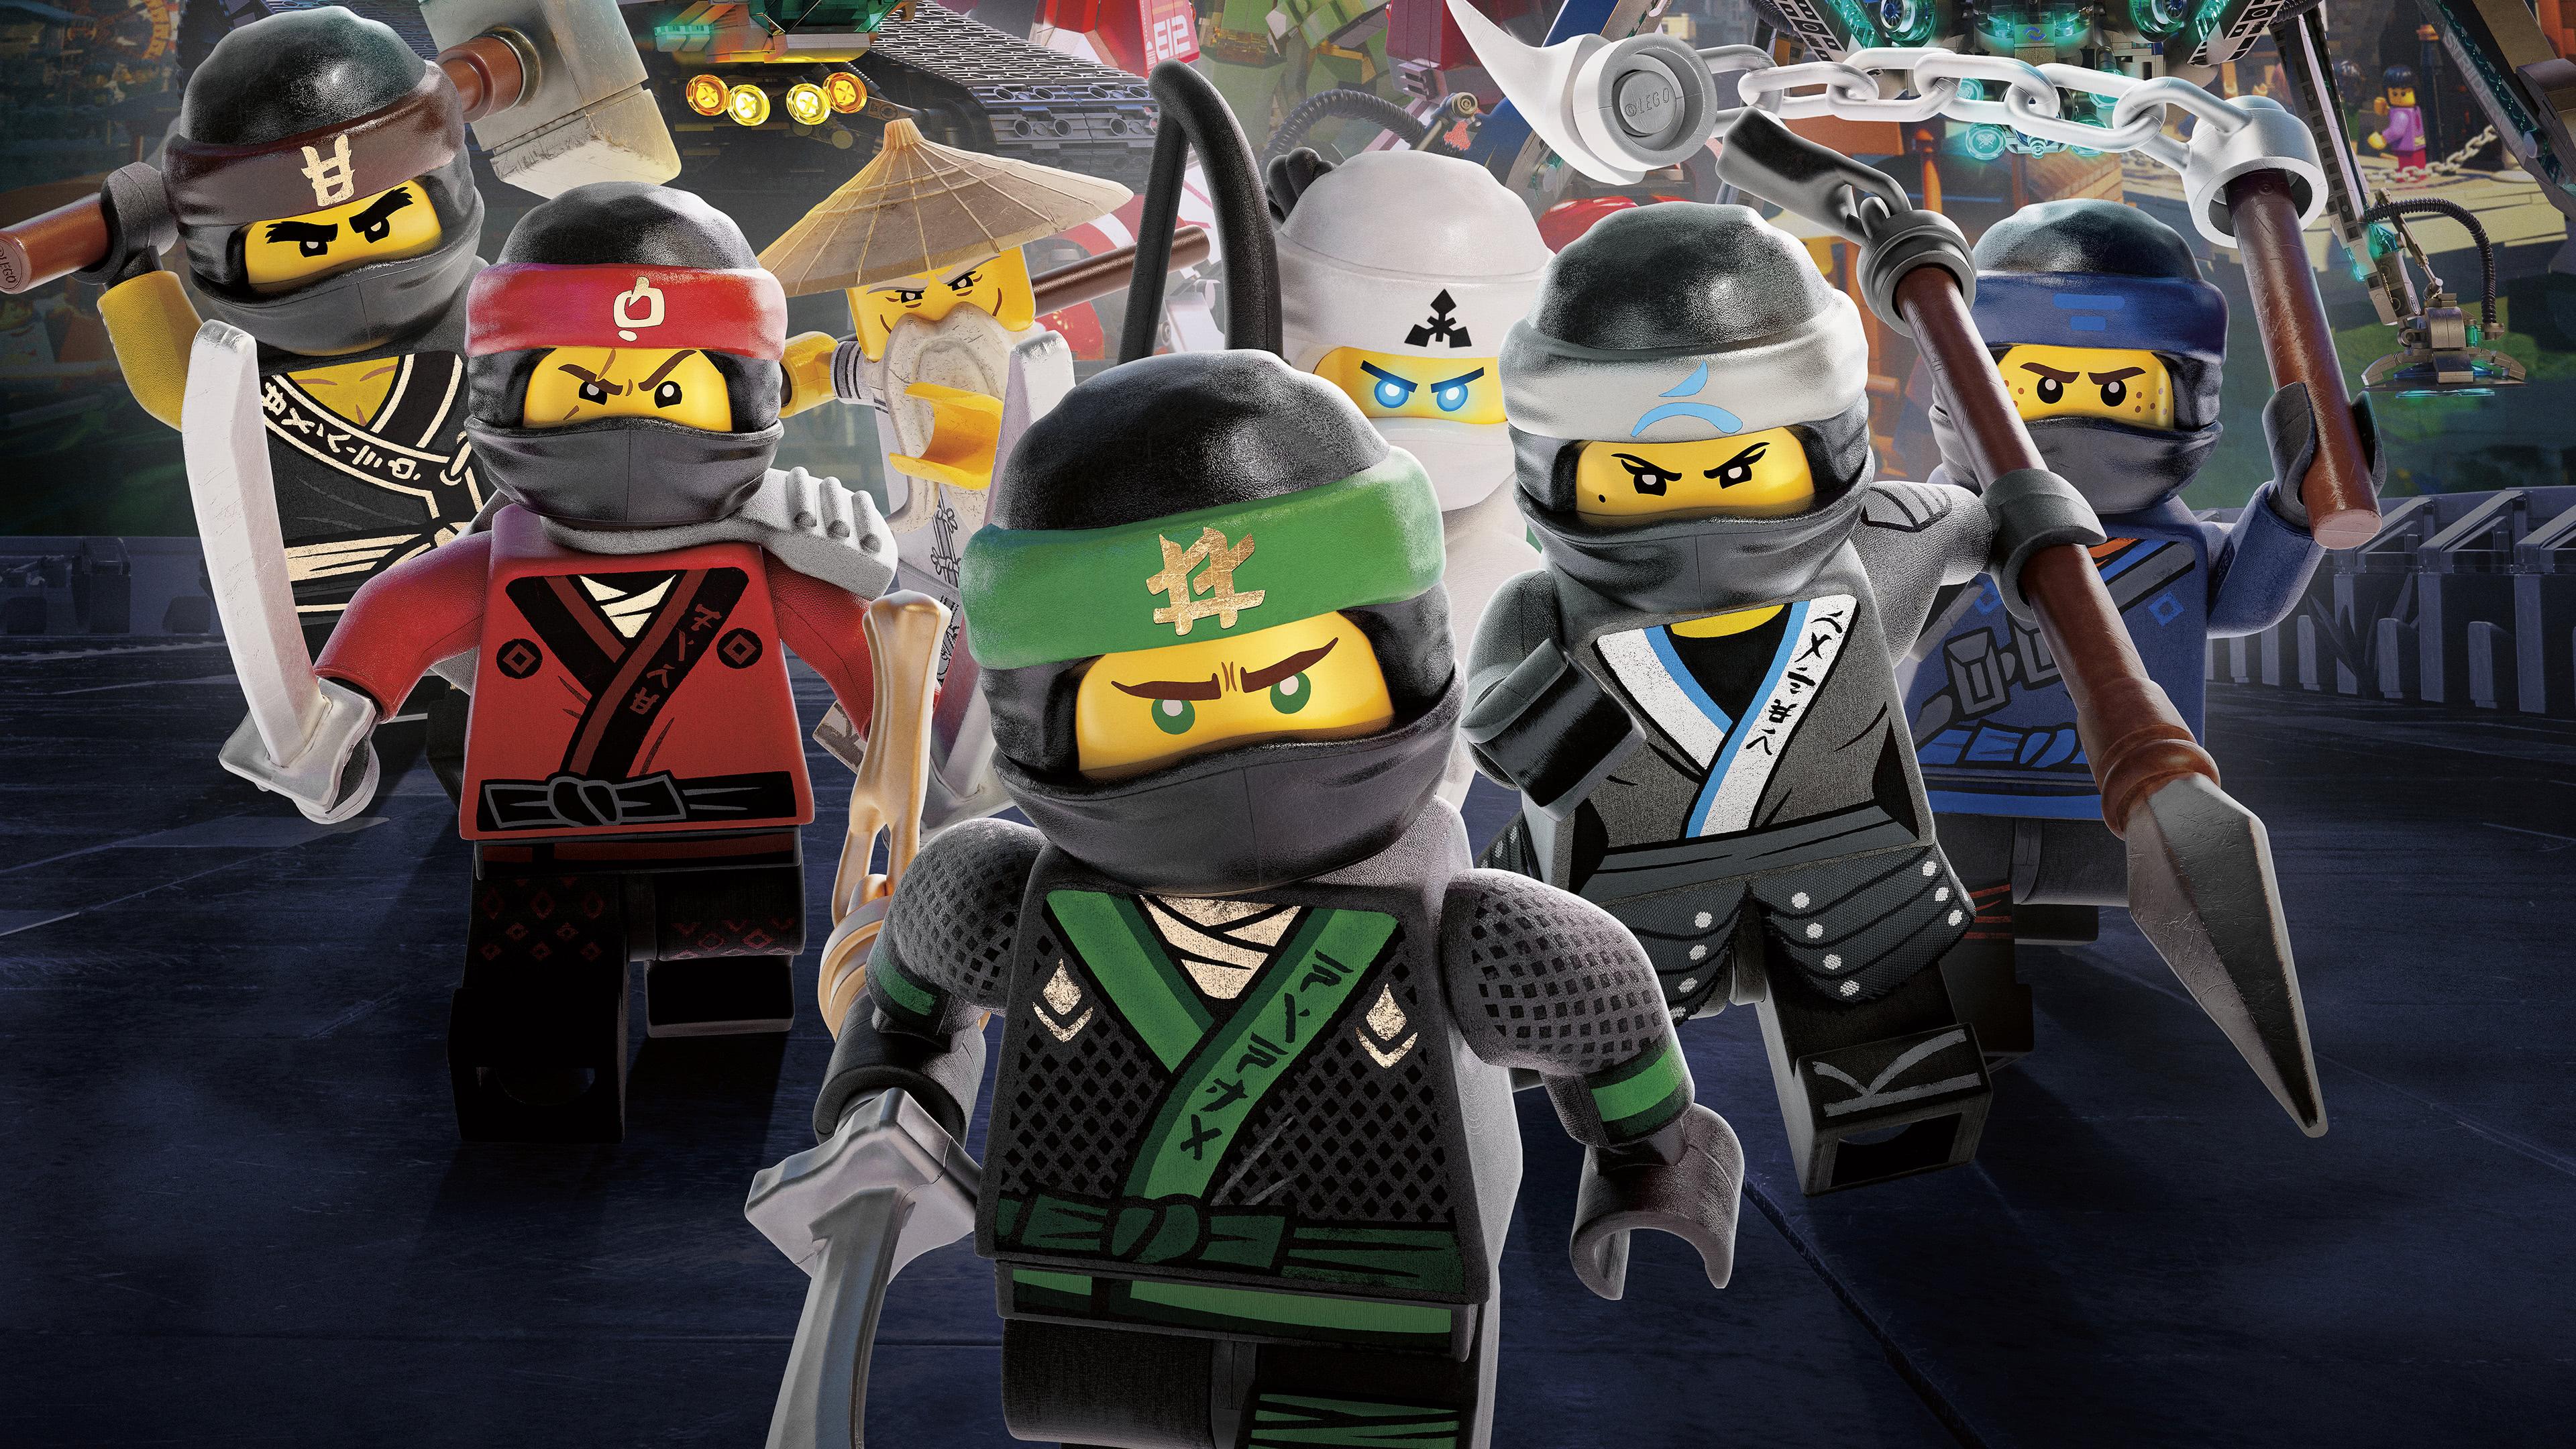 lego ninjago masters of spinjitzu uhd 4k wallpaper